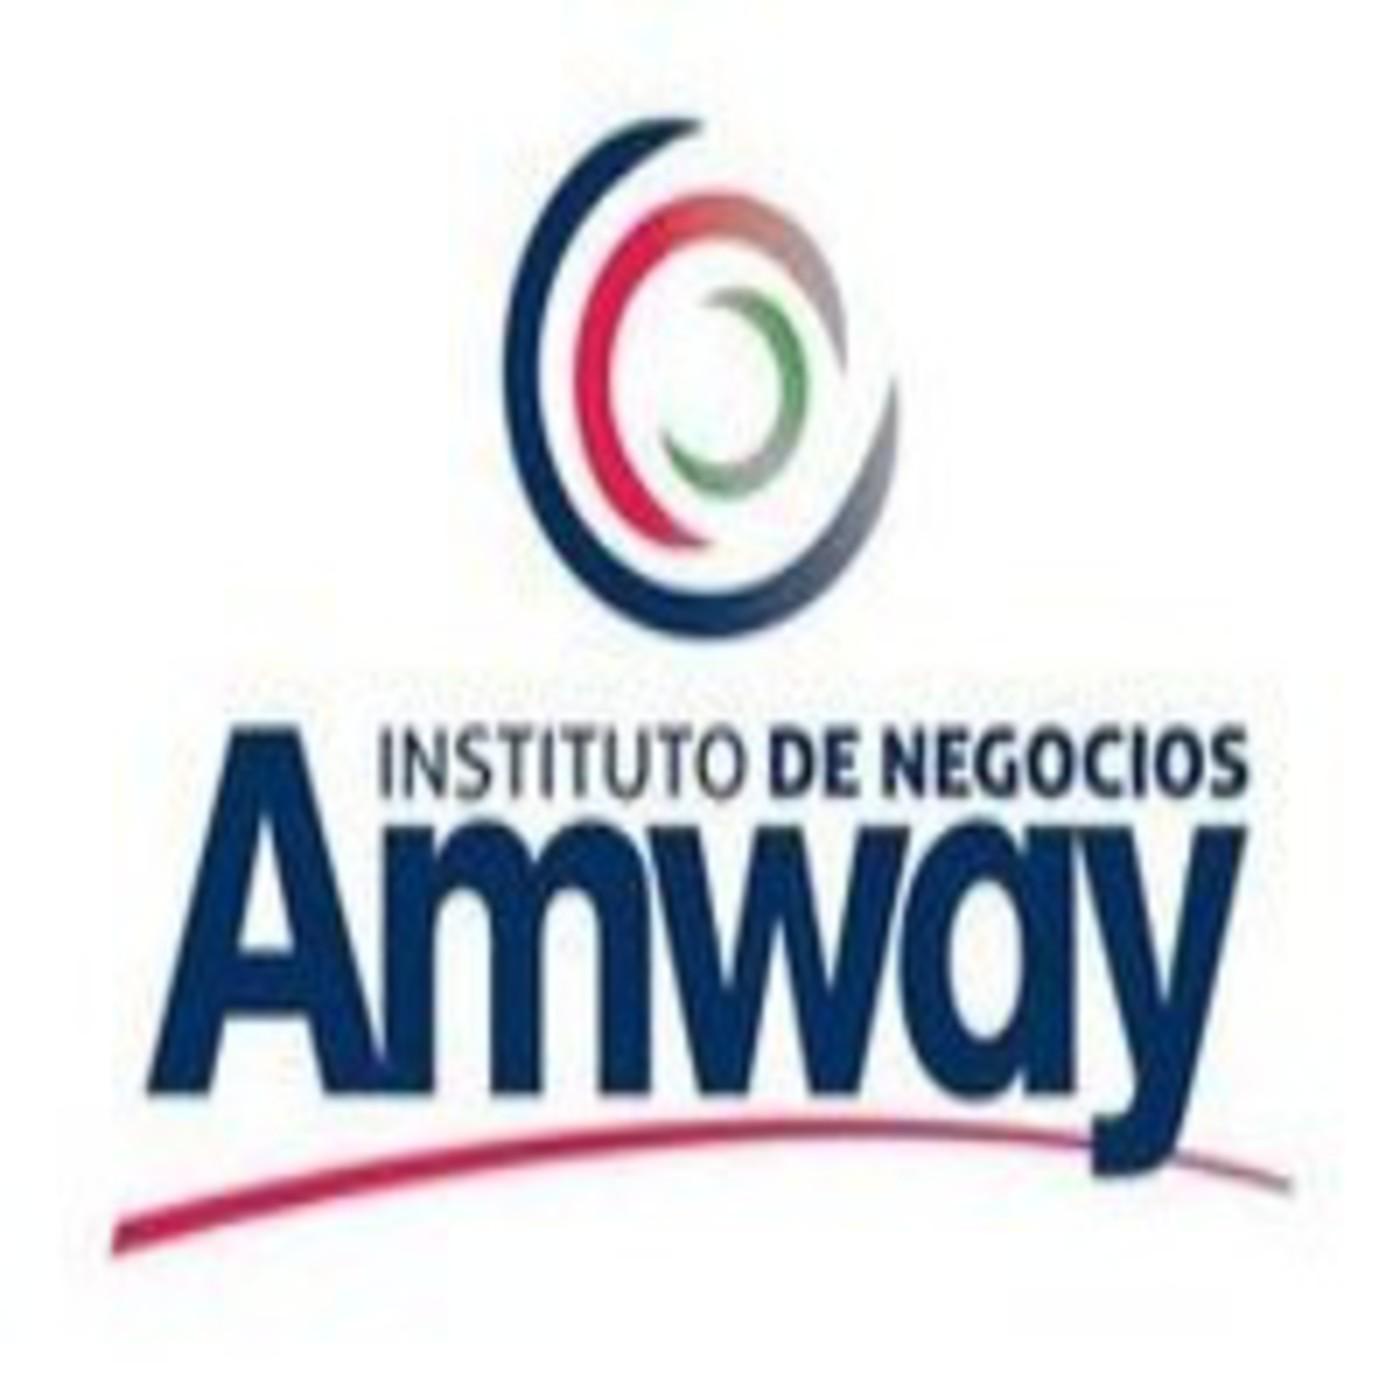 escucha el canal instituto de negocios amway ivoox